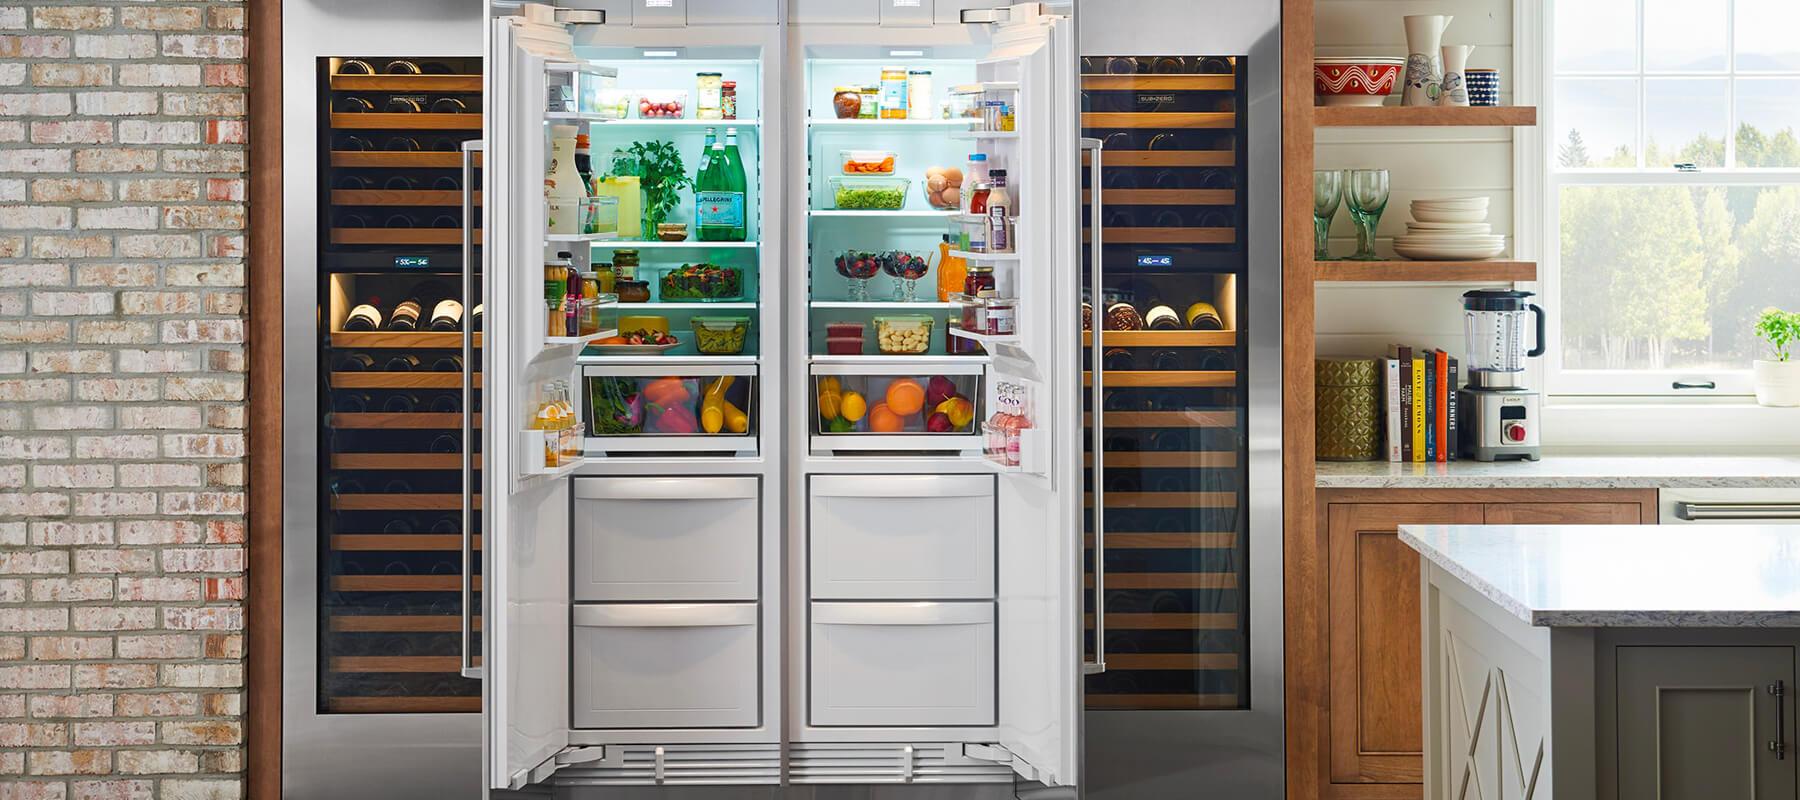 Sub Zero Built in Refrigerator Service | Built-in Refrigerator Repair